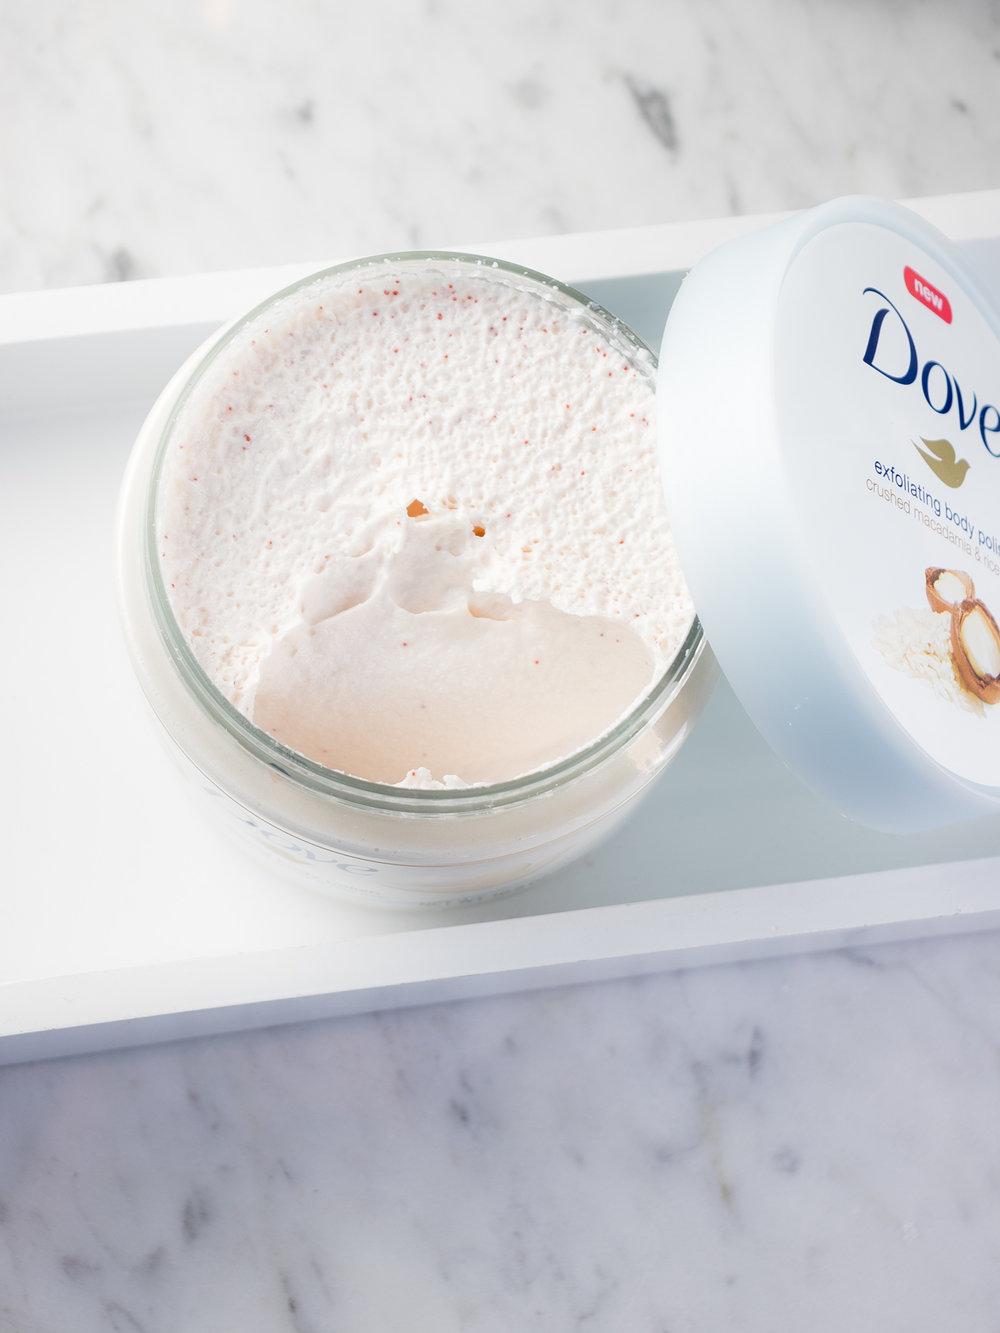 Dove Exfoliating Body Polish with Crushed Macadamia & Rice Milk